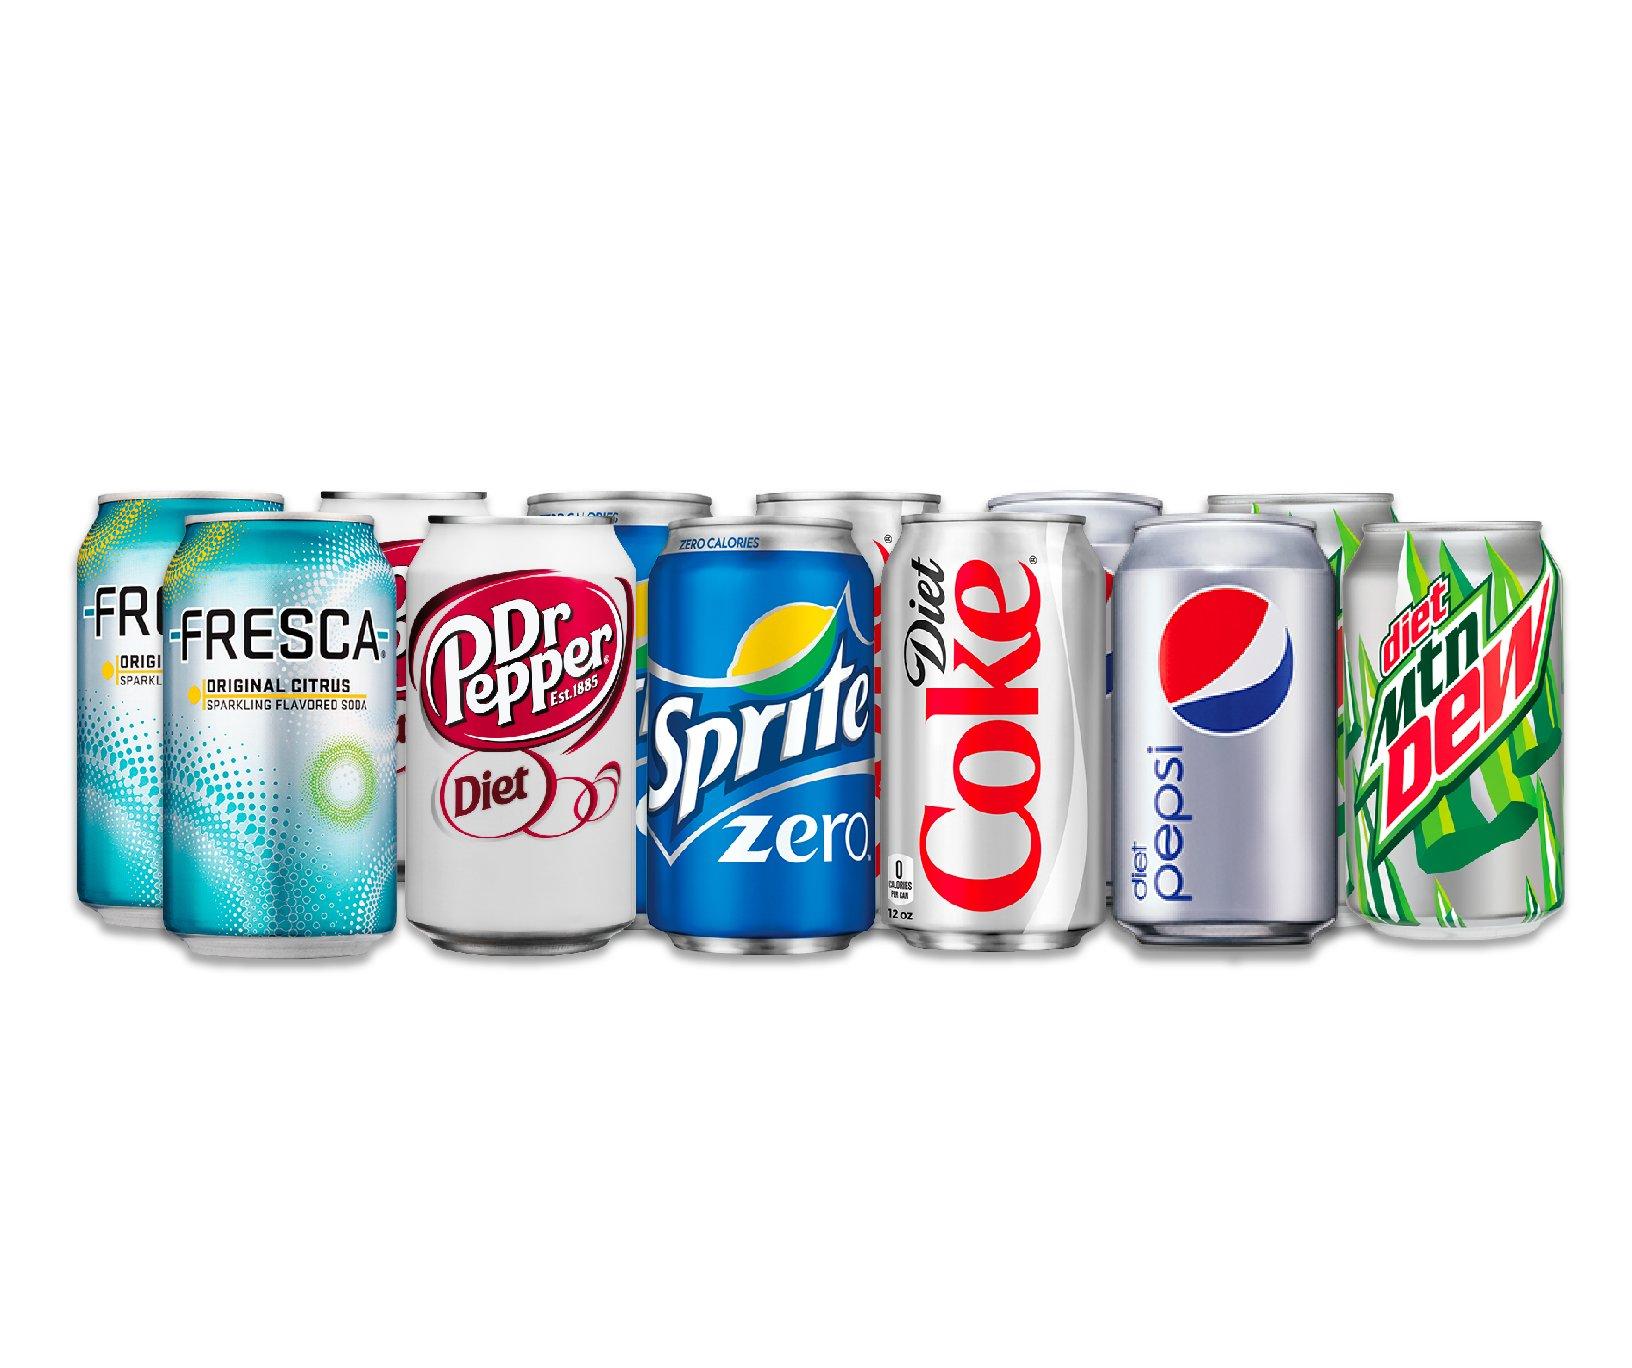 Amazon.com : 12 Can Soda Variety Pack - Assortment of Coke, Pepsi ...